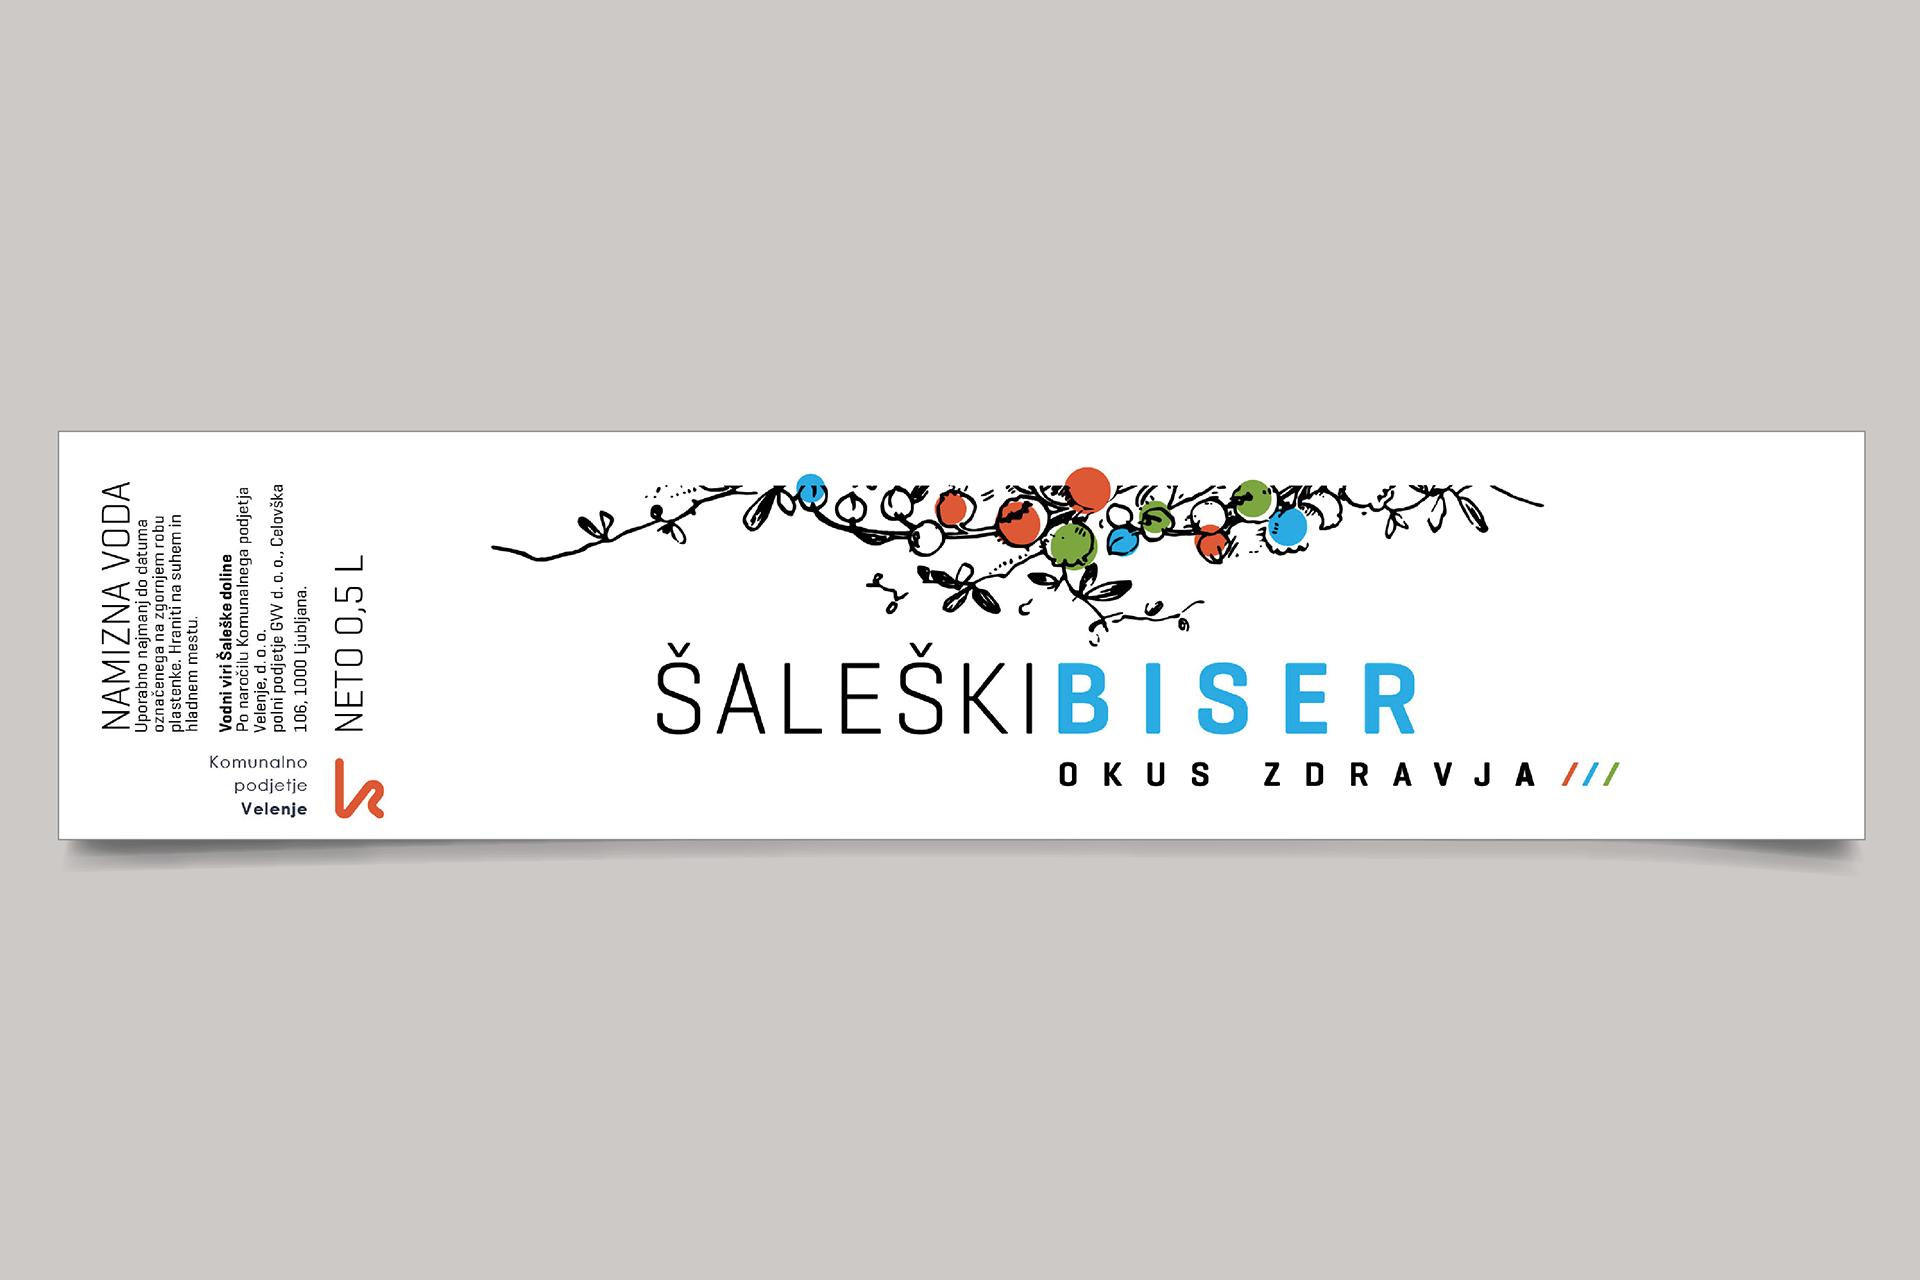 podoba_voda_saleski_biser_etiketa